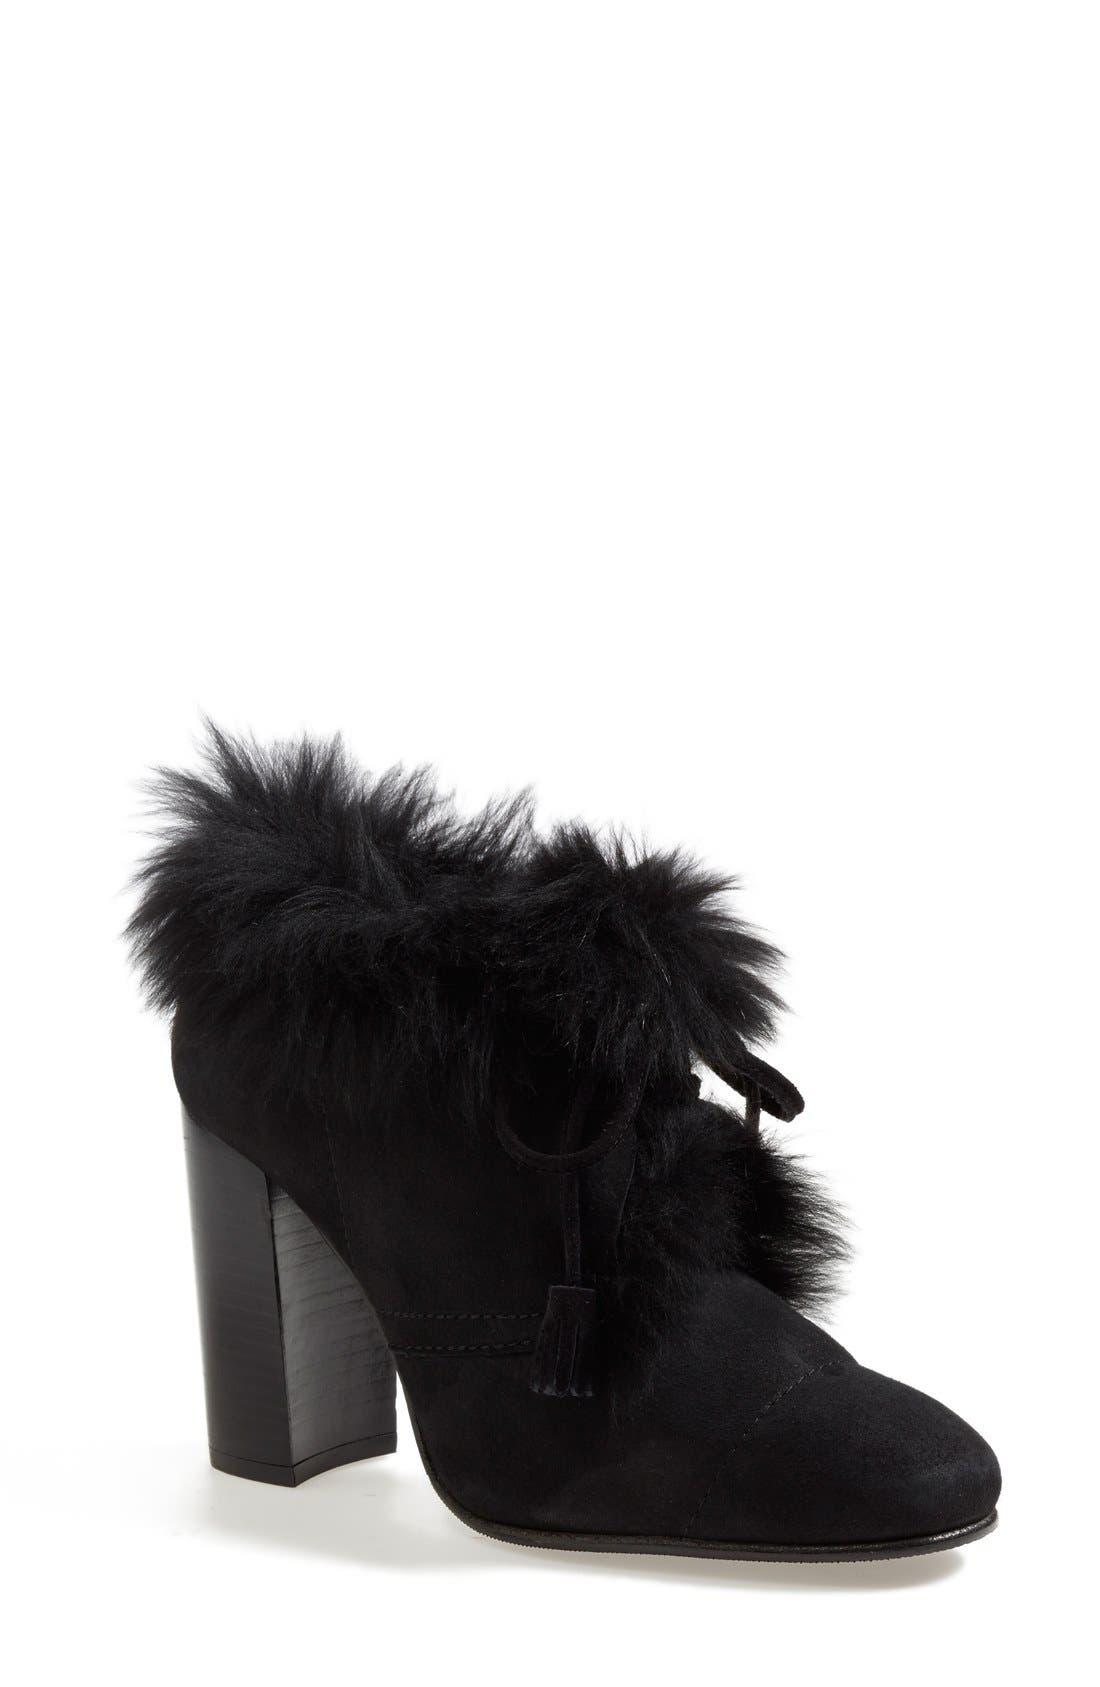 Main Image - Pedro Garcia 'Barbara' Genuine Shearling & Leather Bootie (Women)